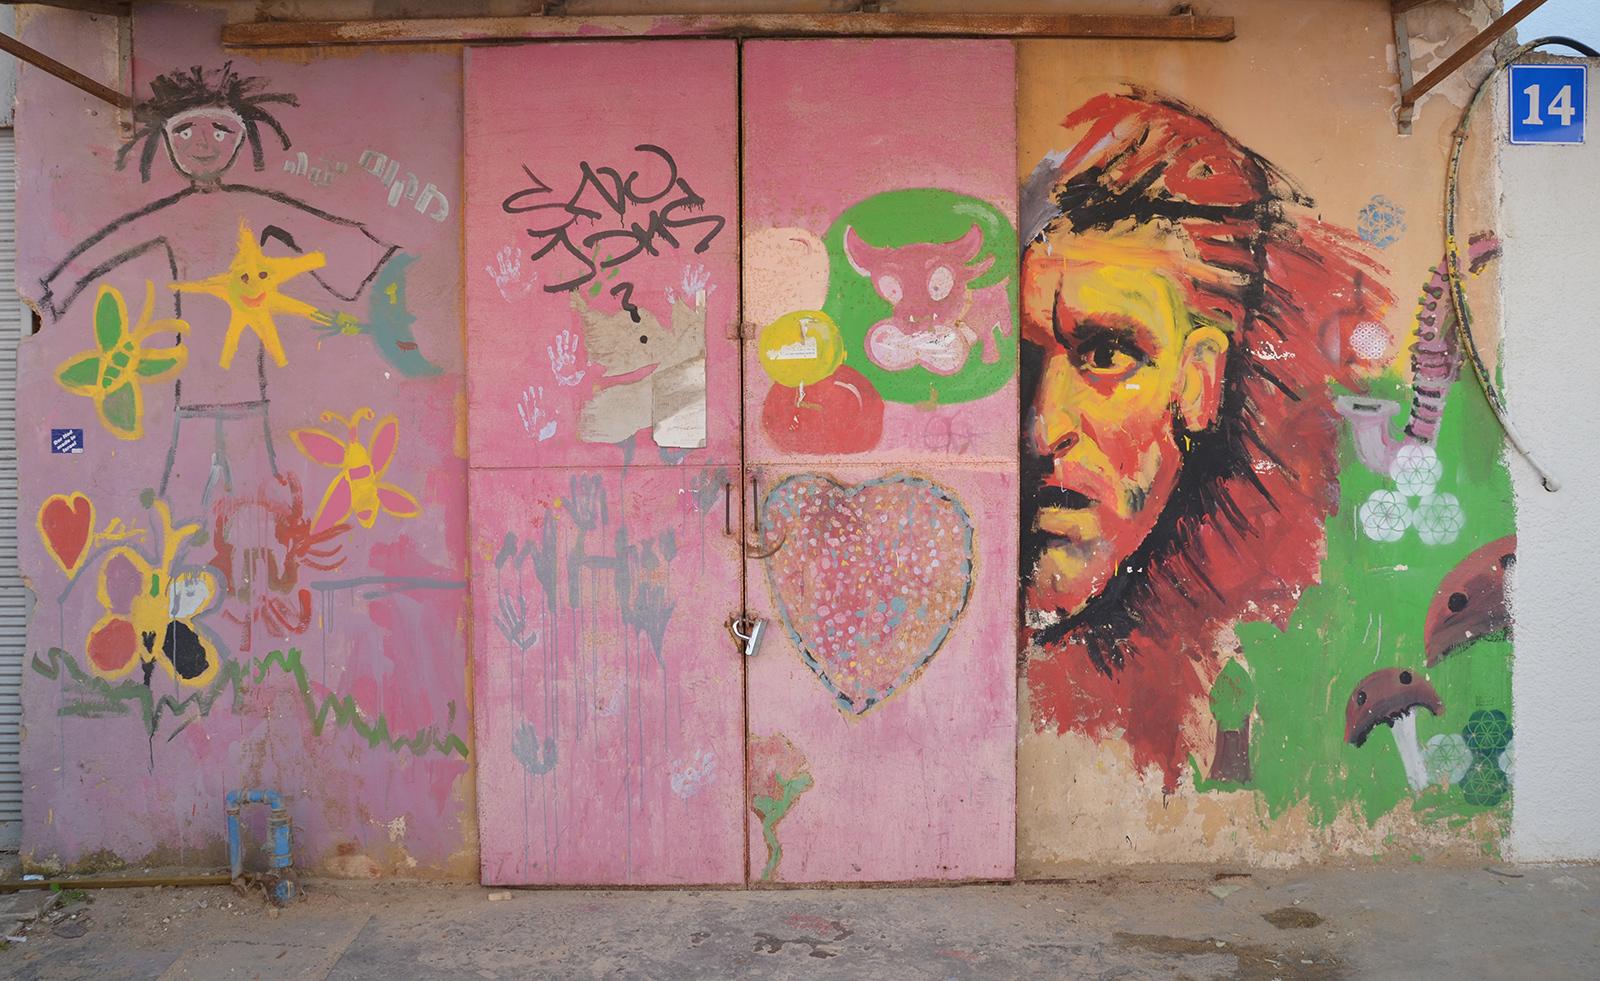 Uličky čtvrti Florentin v době šabatu, Tel-Aviv, Izrael